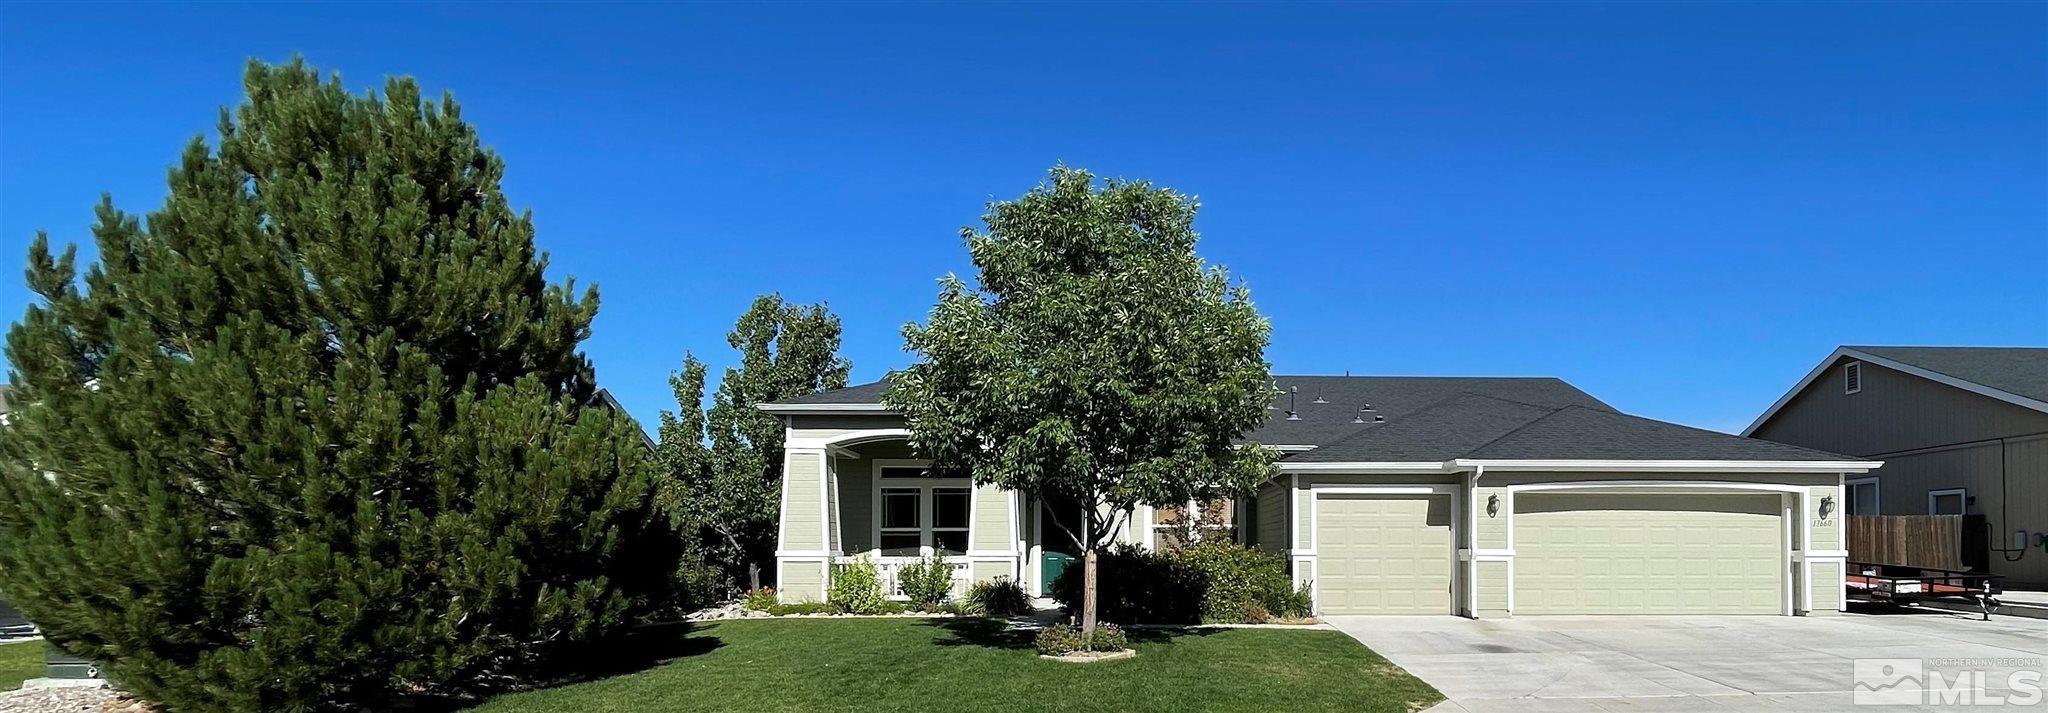 Image for 17660 Boulder Springs Ct, Reno, NV 89508-6020